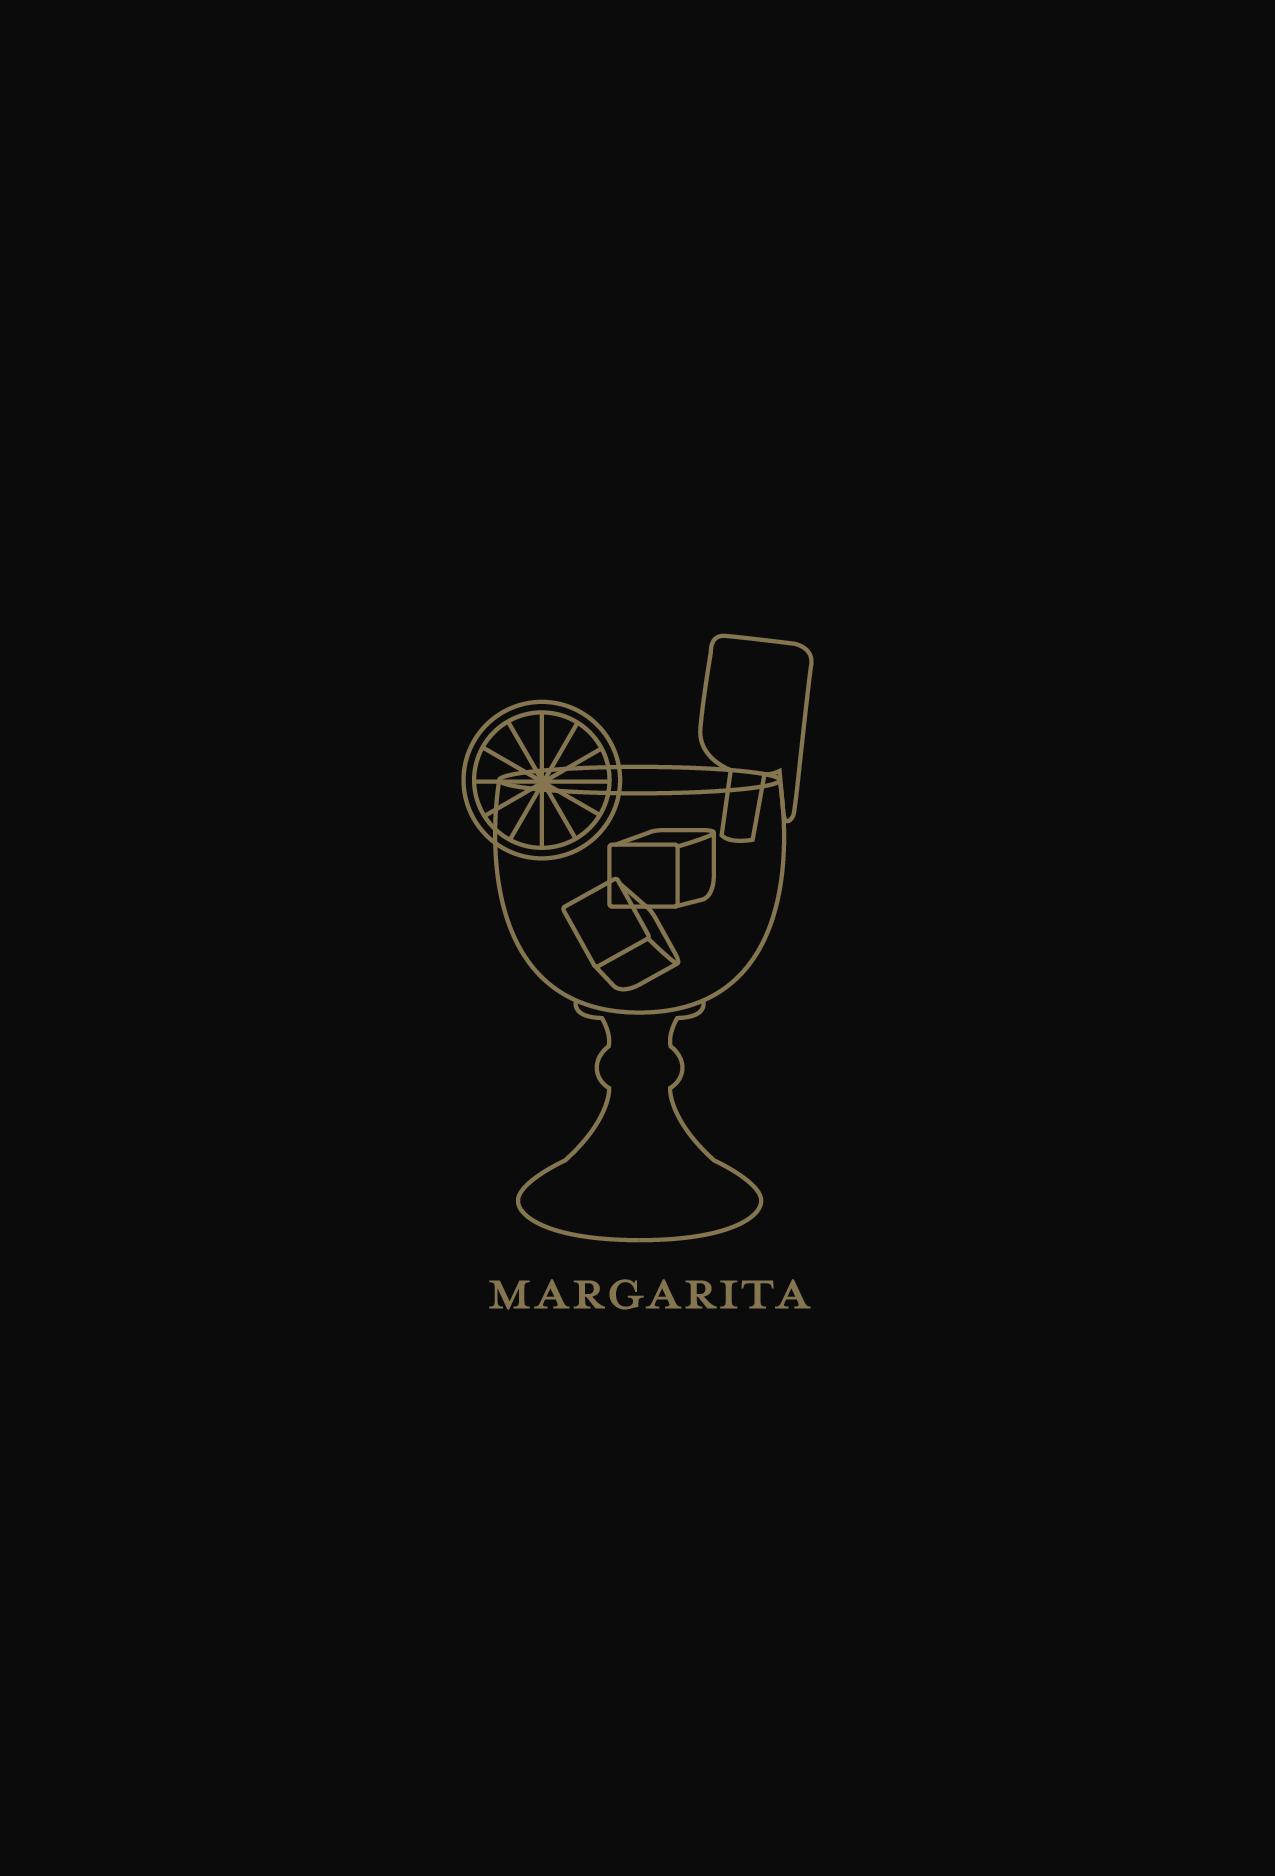 10_10 Design_Margarita Front.png